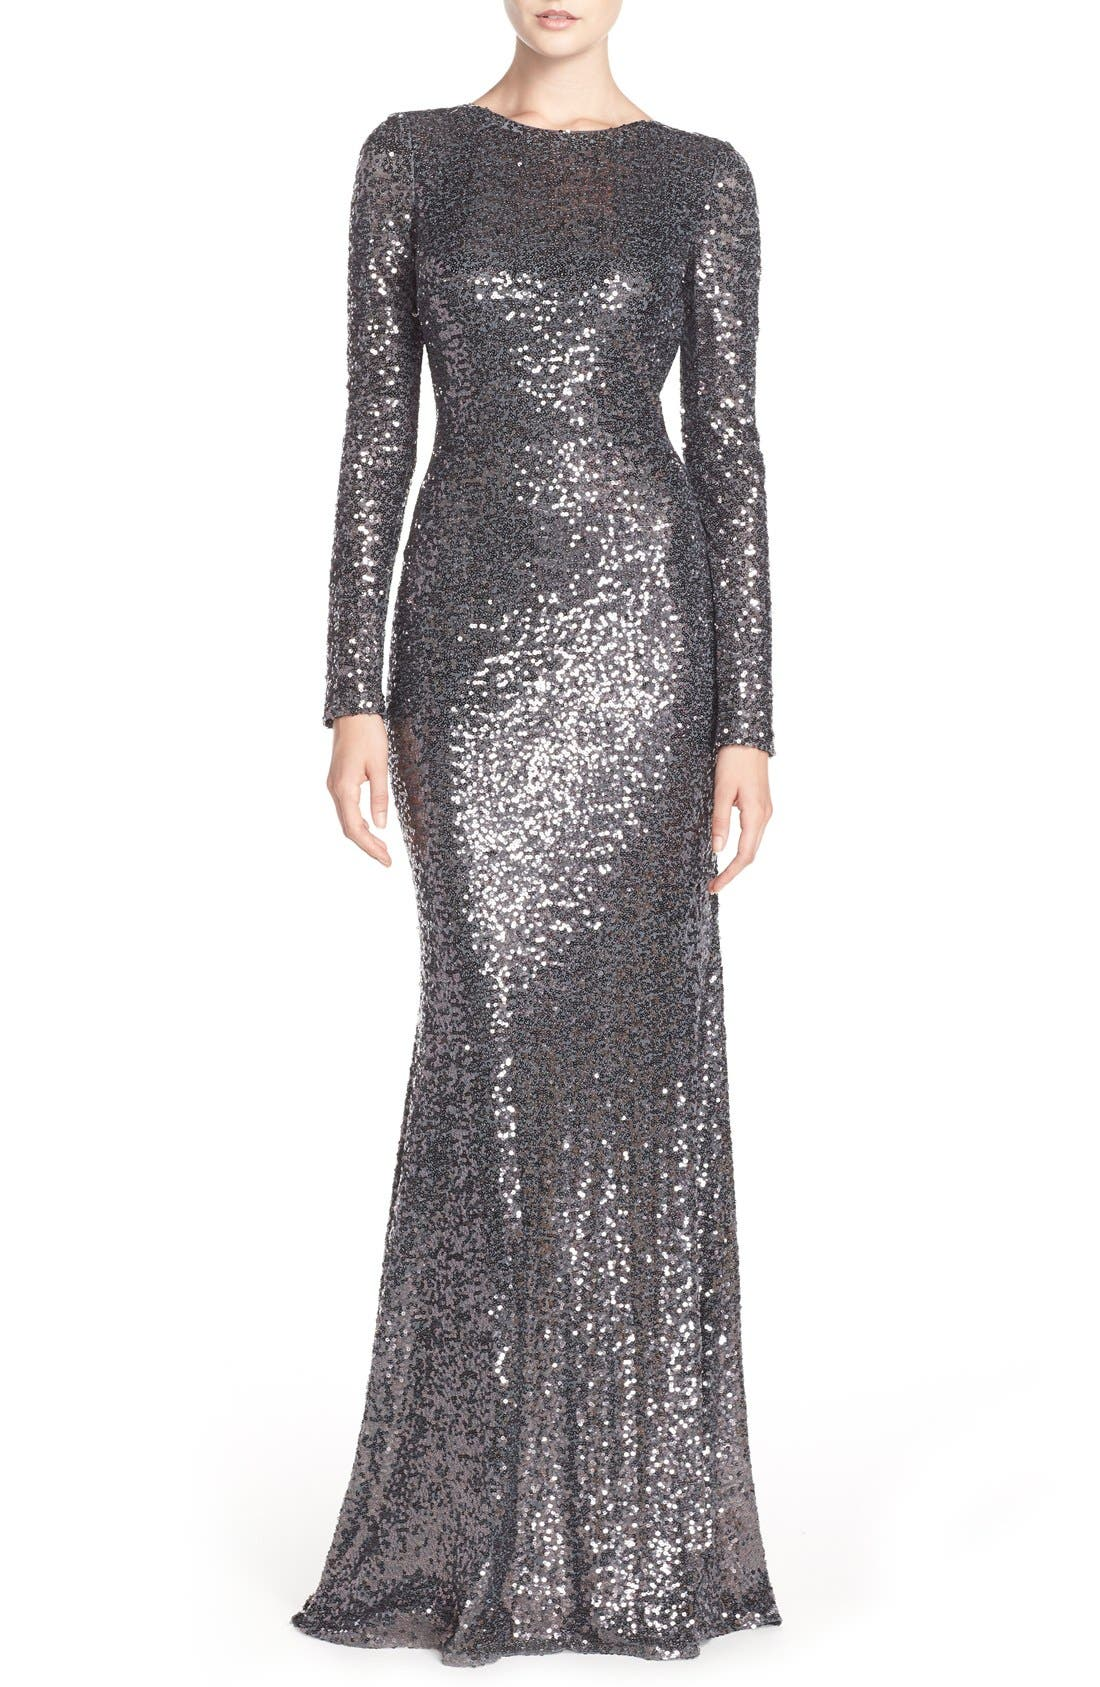 Alternate Image 1 Selected - Badgley Mischka Cowl Back Sequin Gown